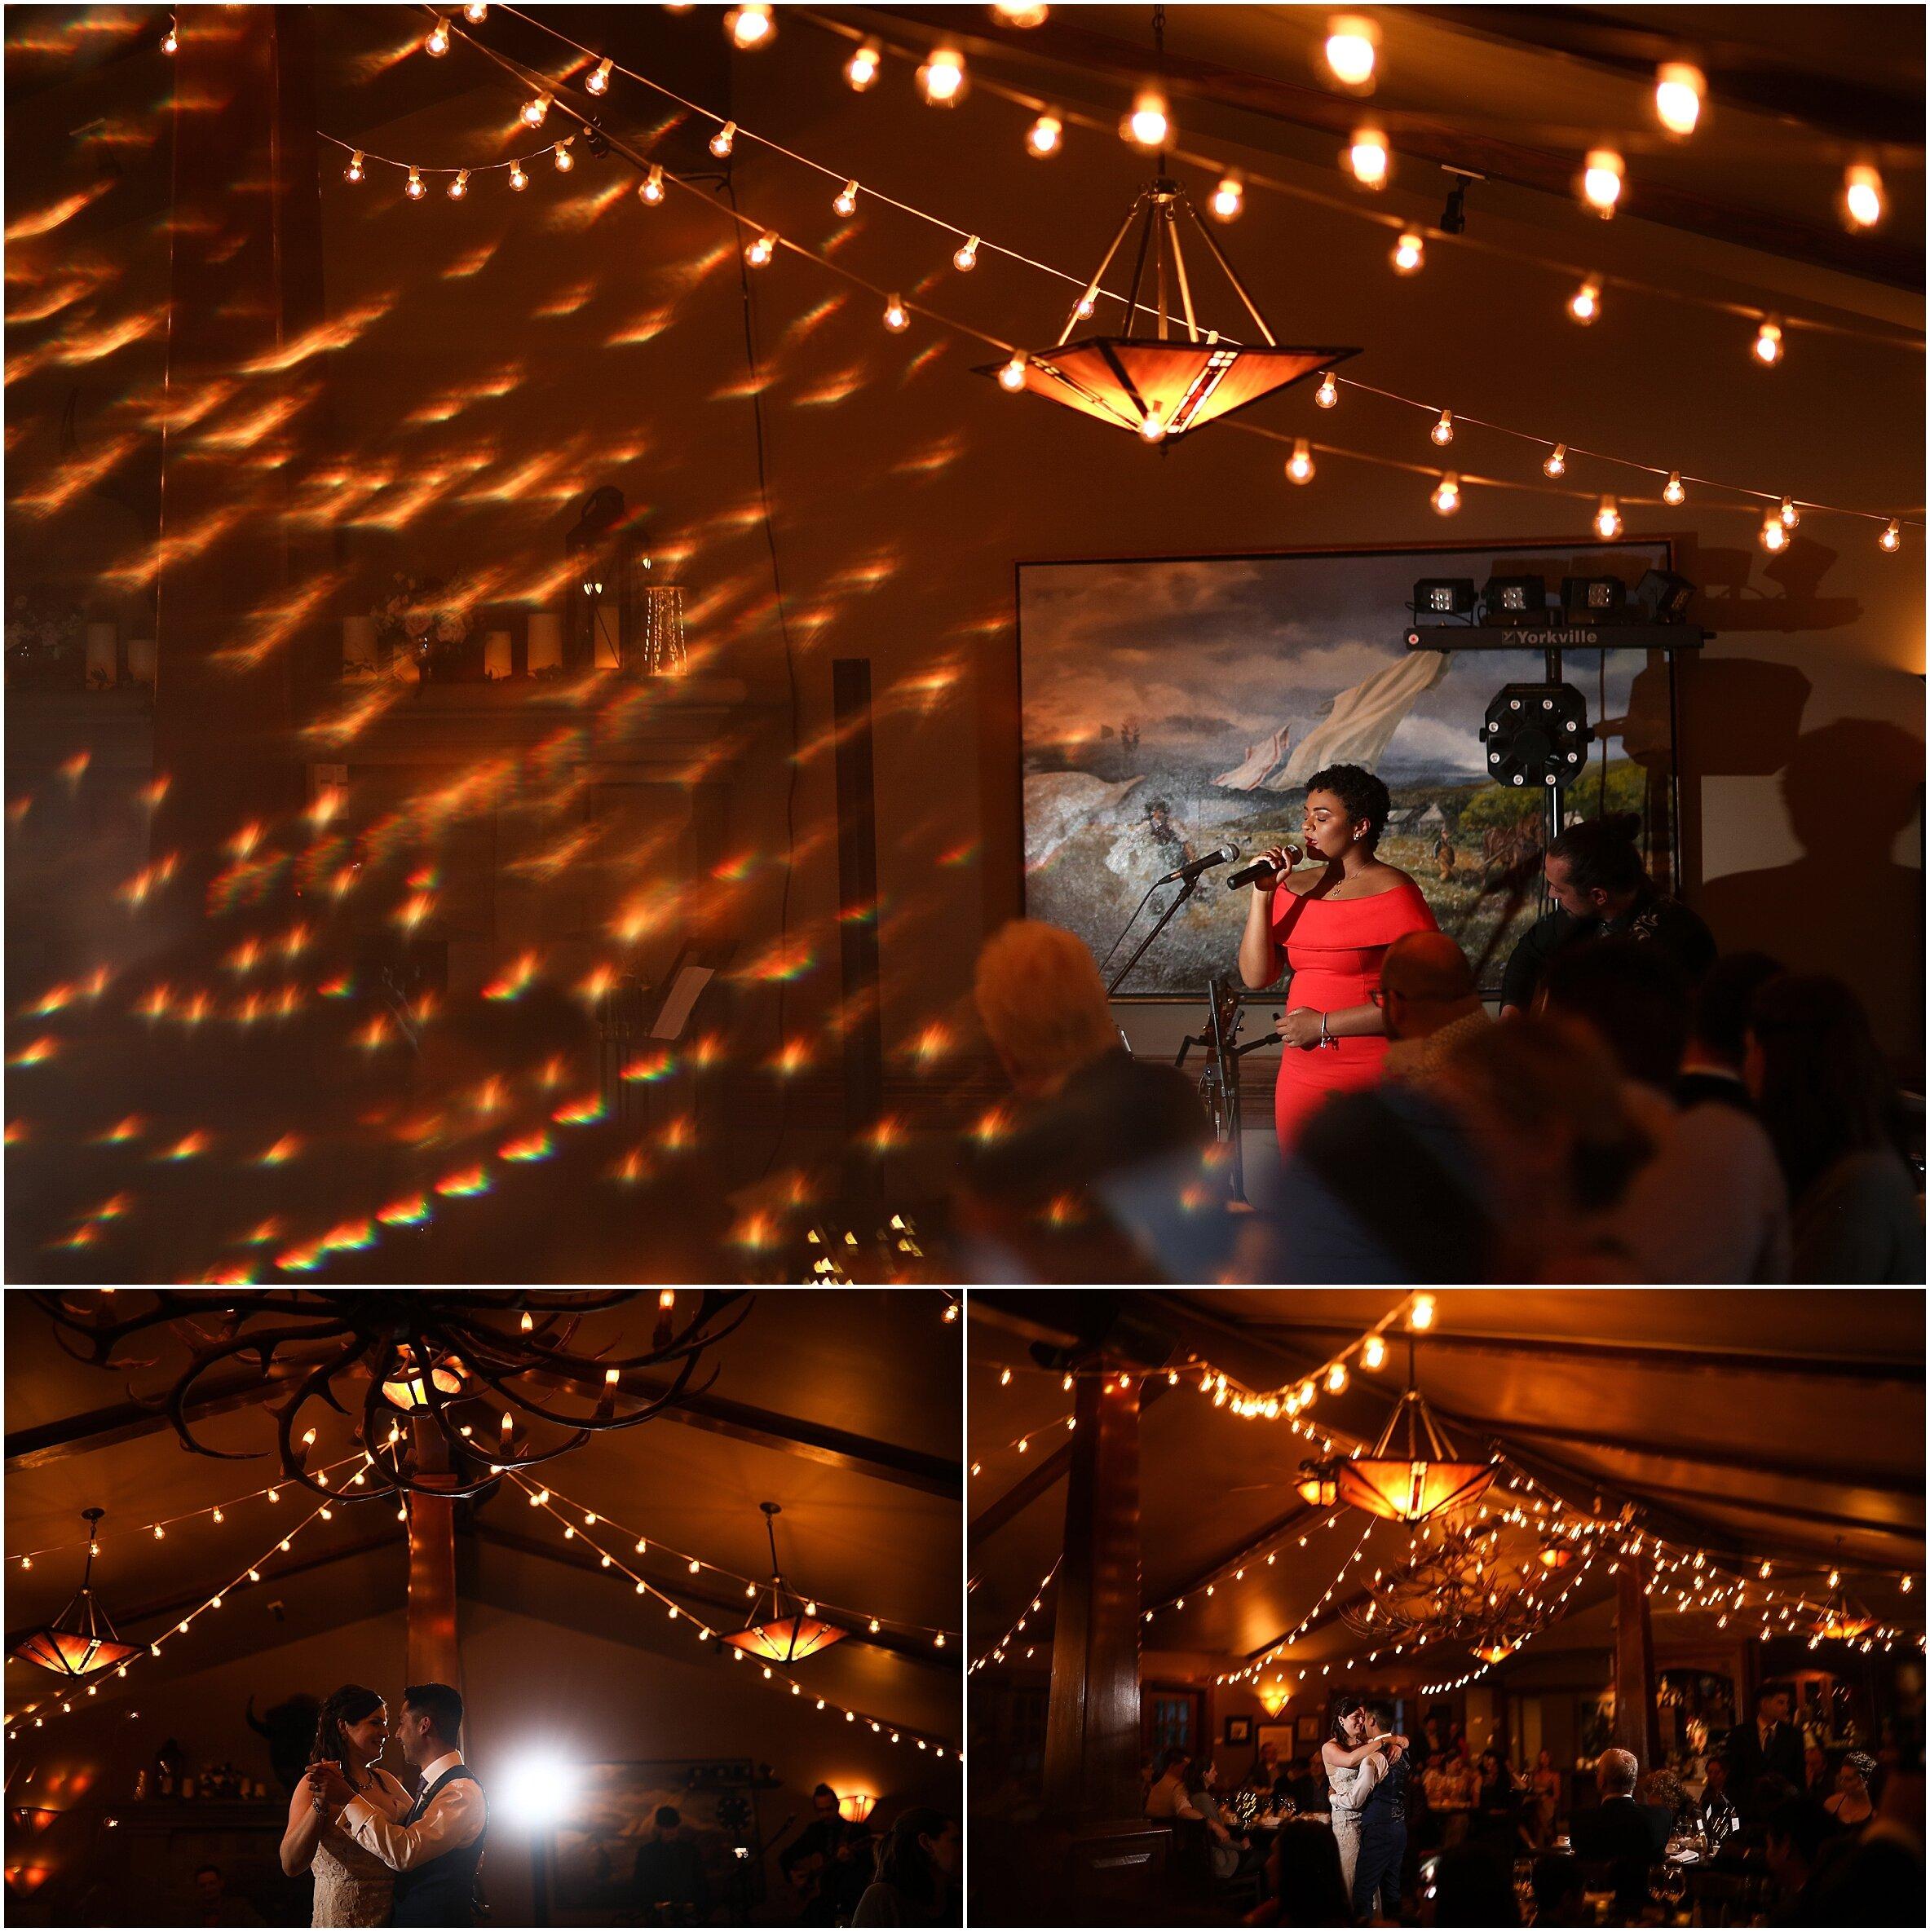 vancouver-wedding-photographer-the-loft-earls-yaletown_0116.jpg